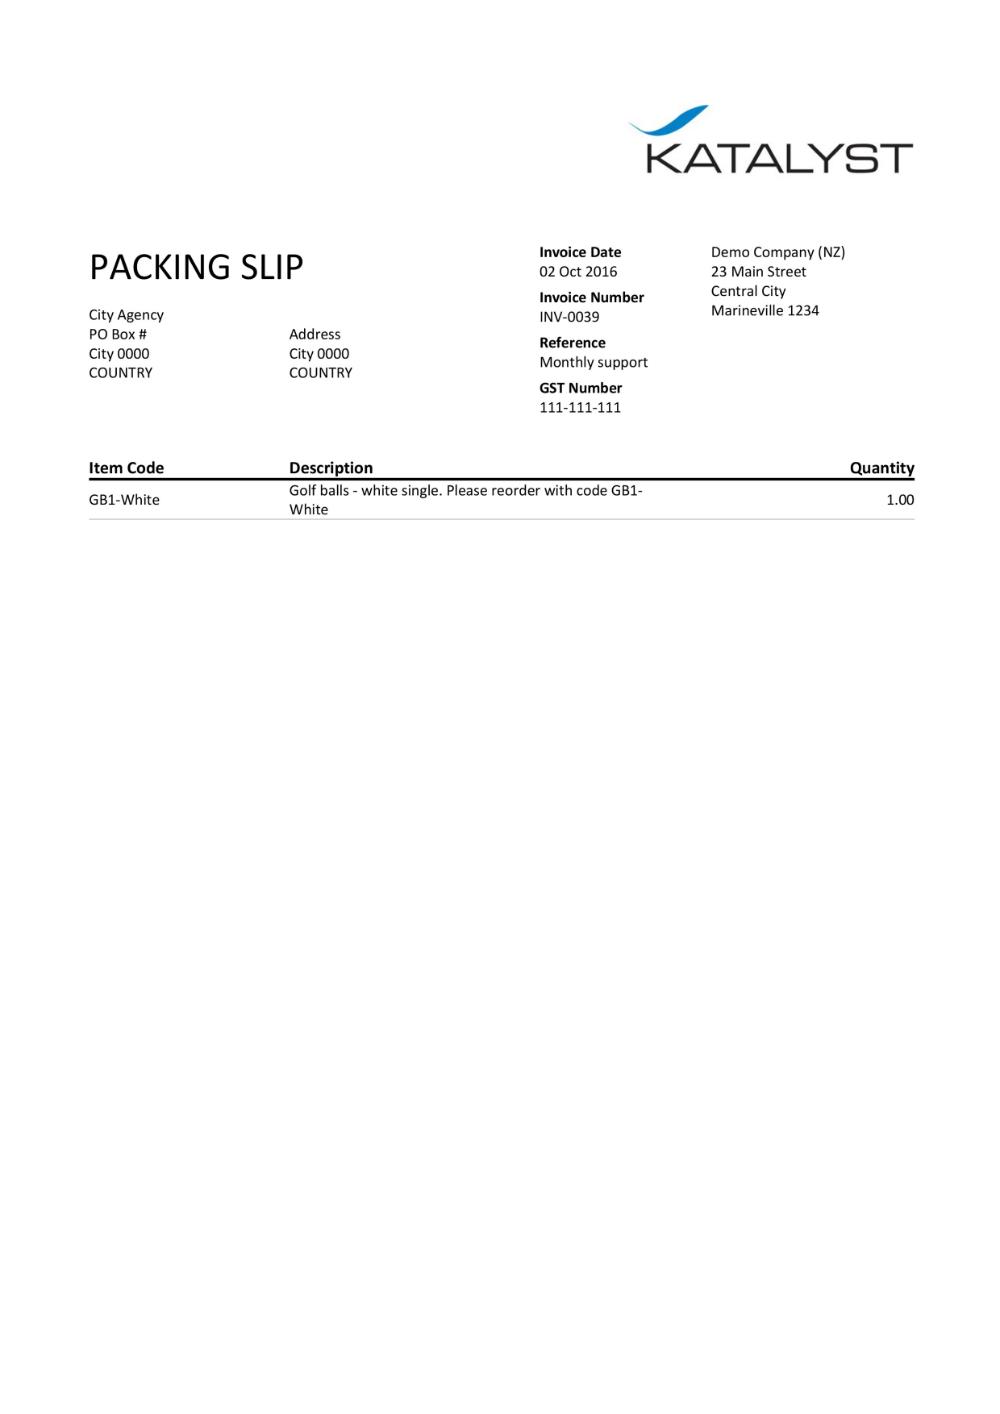 Xero Custom Template Packing Slip Katalyst Office Bookkeeper Inside Xero Custom Invoice Template 10 Profes Invoice Template Custom Templates Customs Invoice